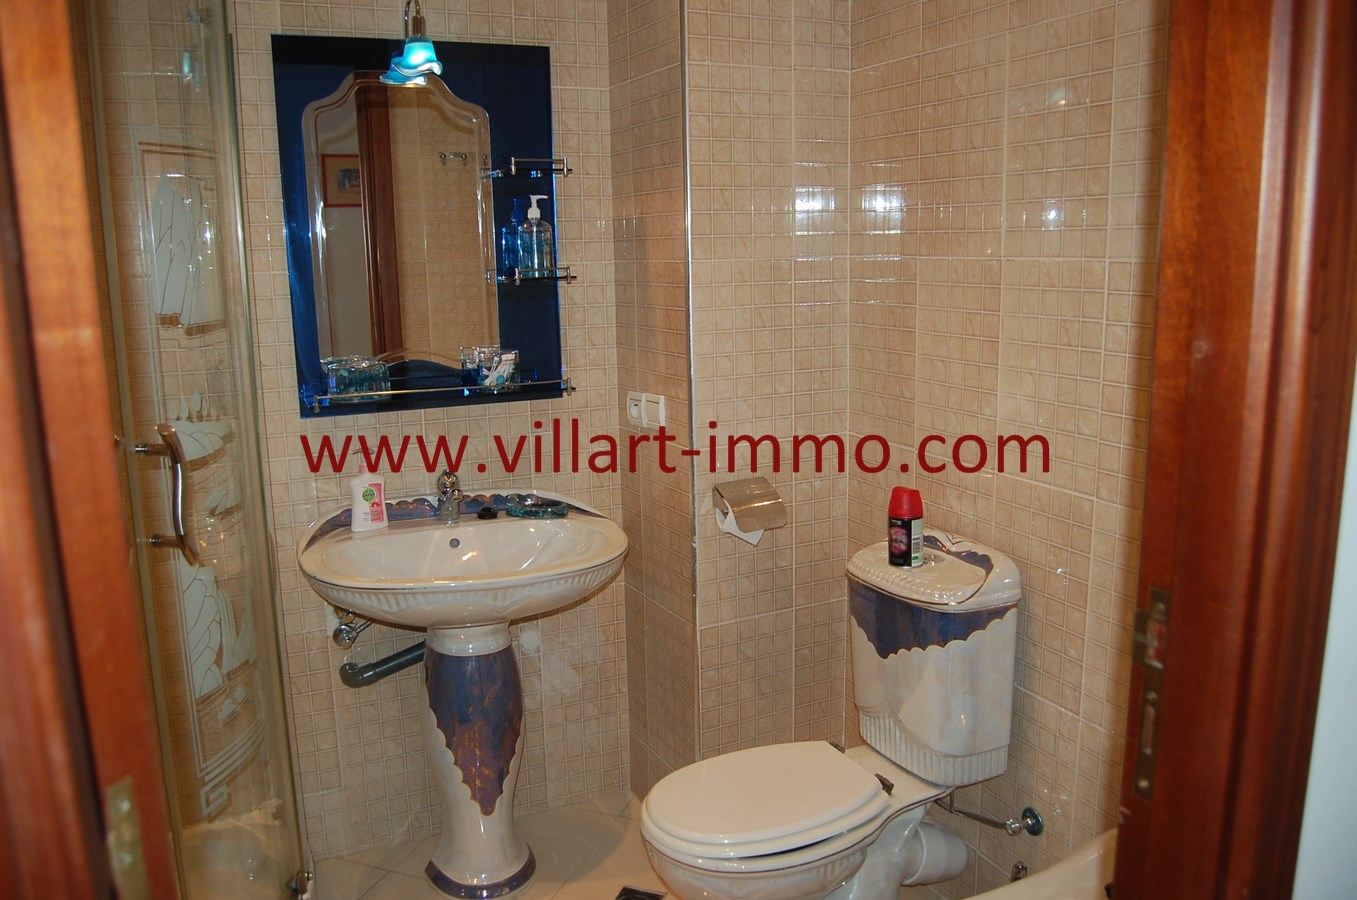 12-Vente-Appartement-Tanger-Route de Rabat-Salle de Bain-VA494-Villart Immo